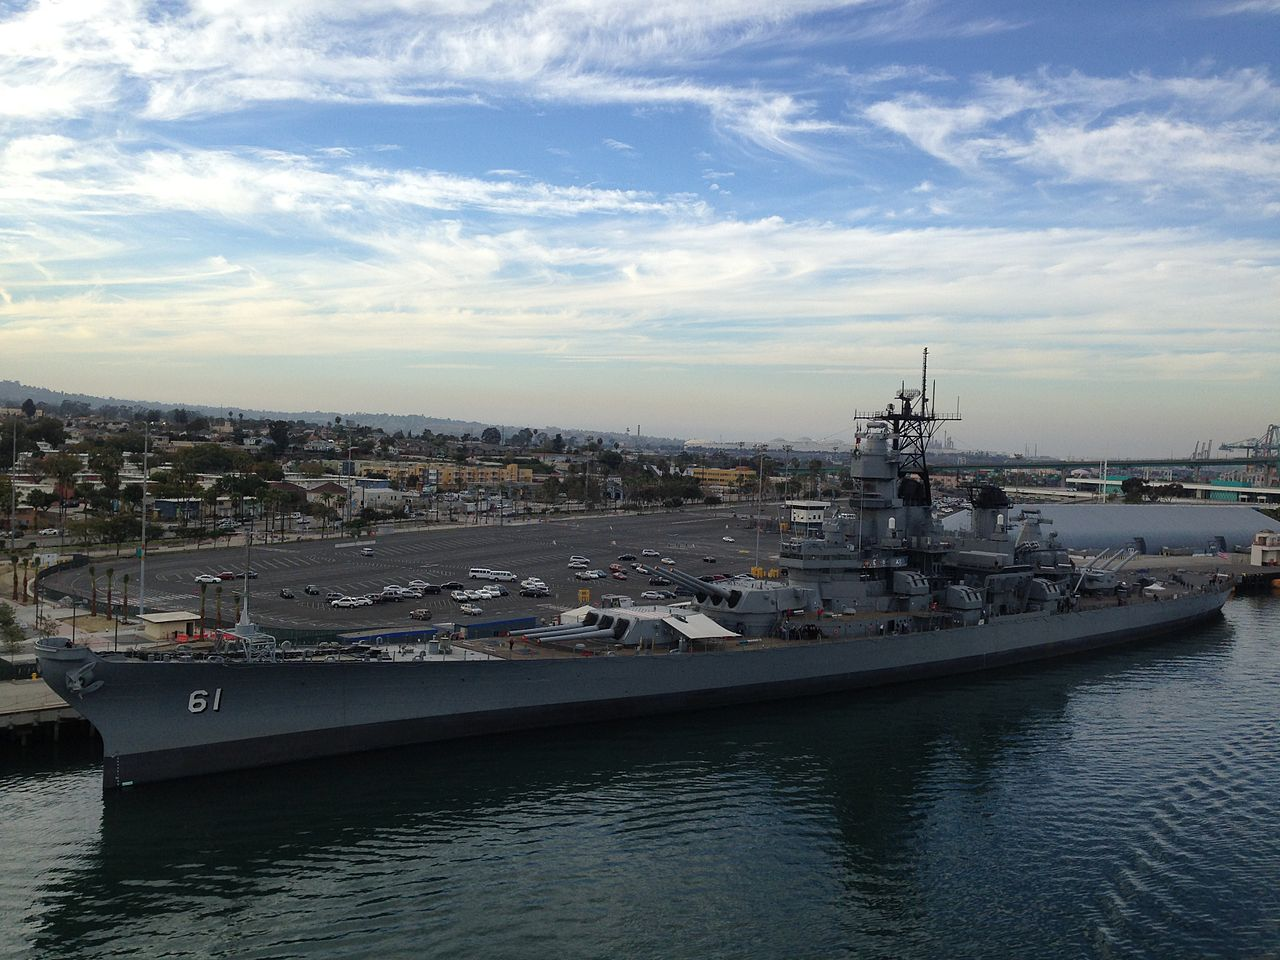 Best Museum in Los Angeles-Battleship USS Iowa Museum